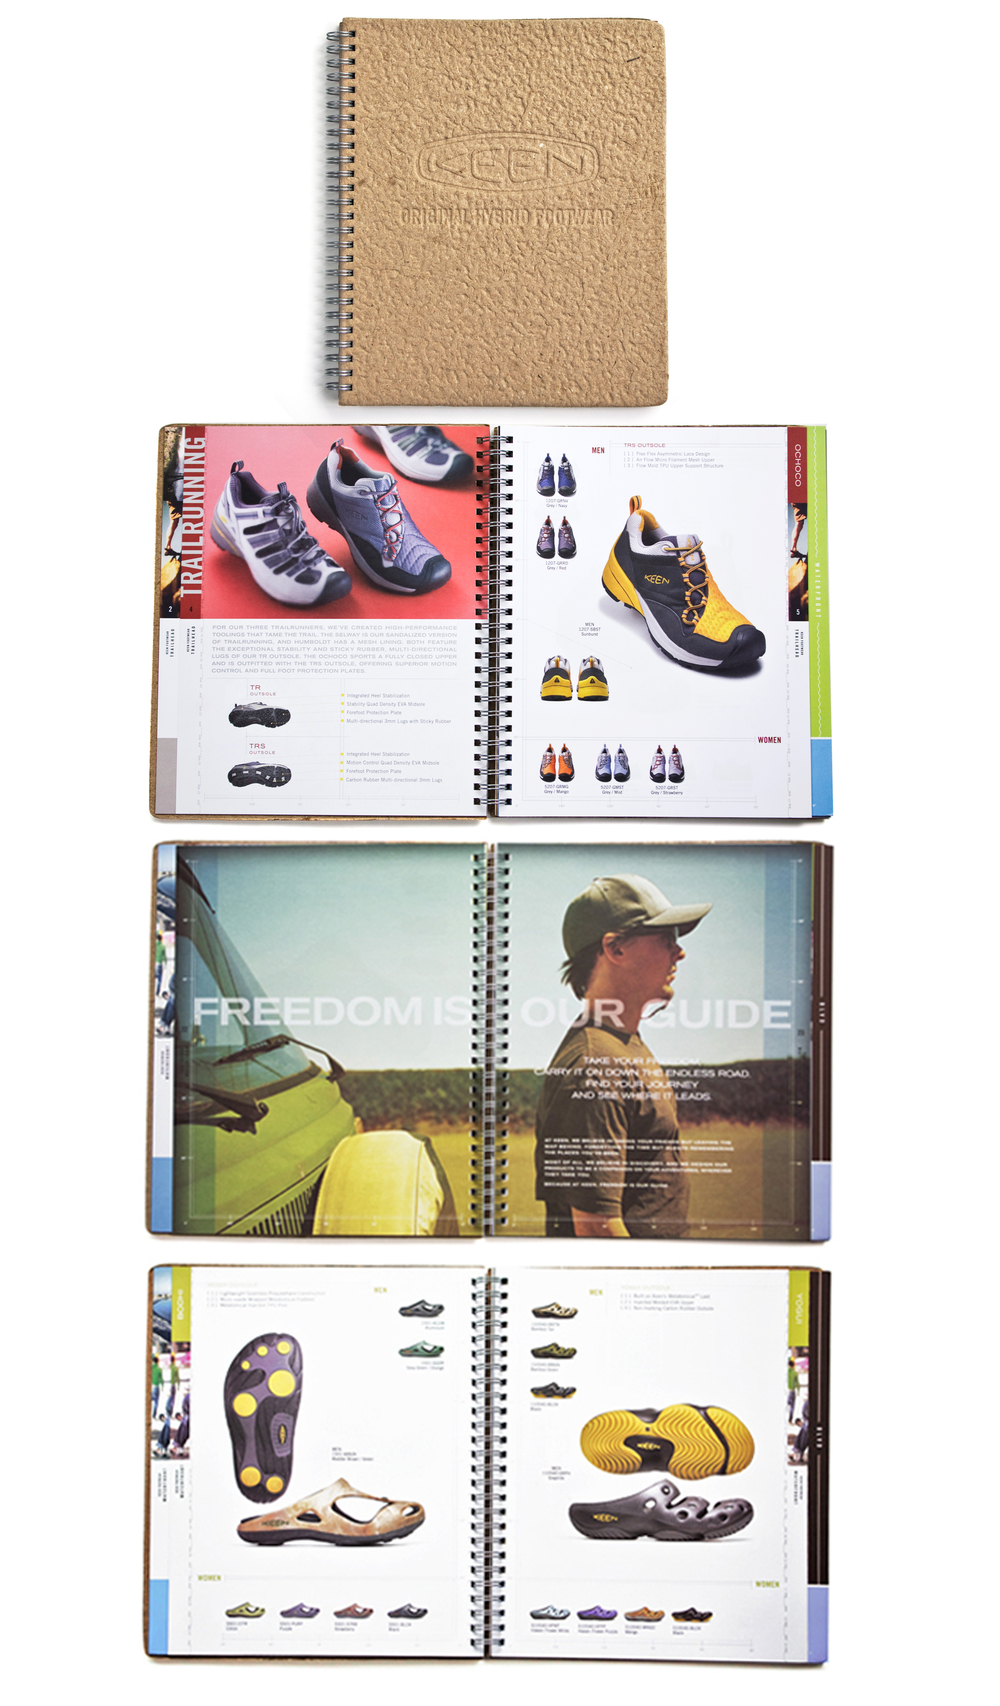 Keen_Catalog.jpg